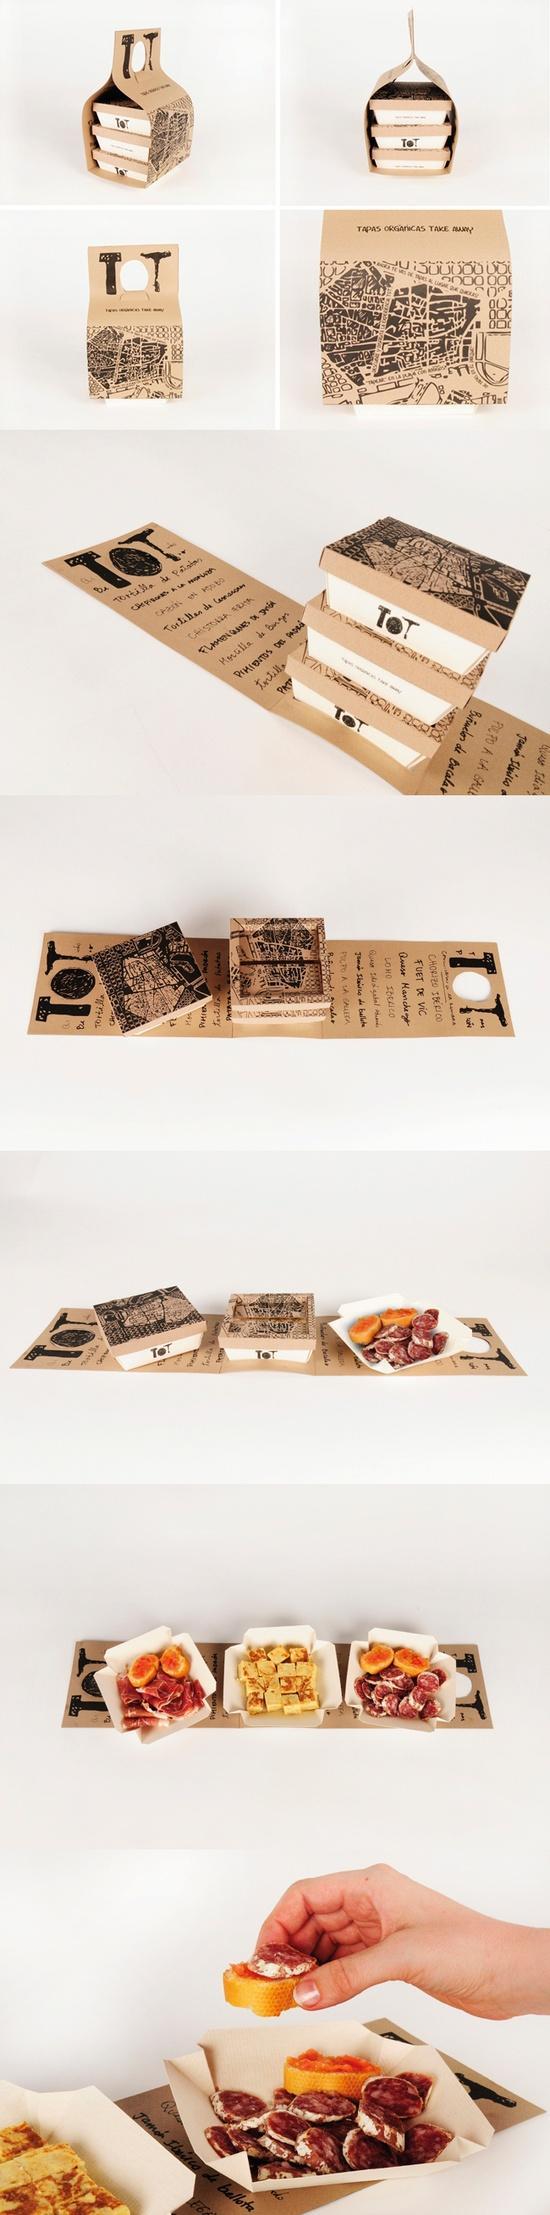 Robbie's Handmade Cinnamon Rolls - image 2 - student project